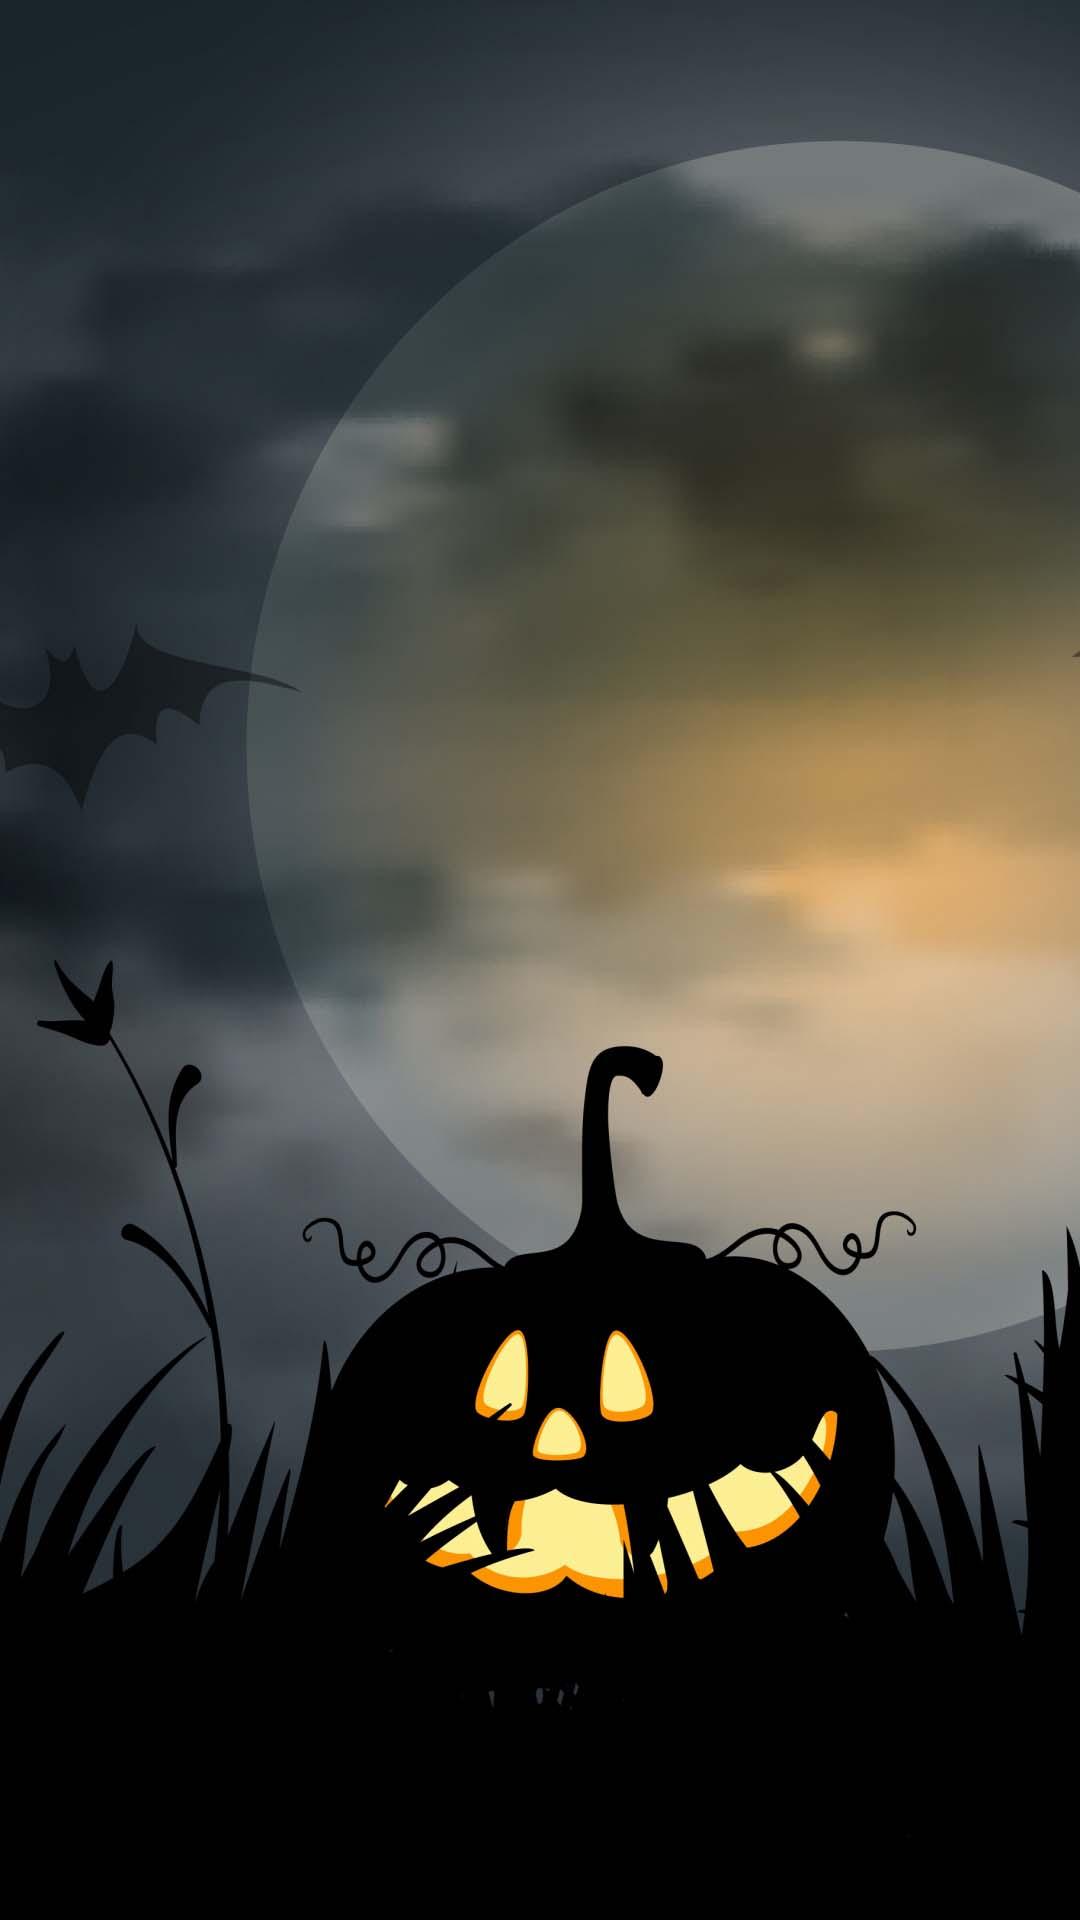 Ảnh nền Halloween cho mobile